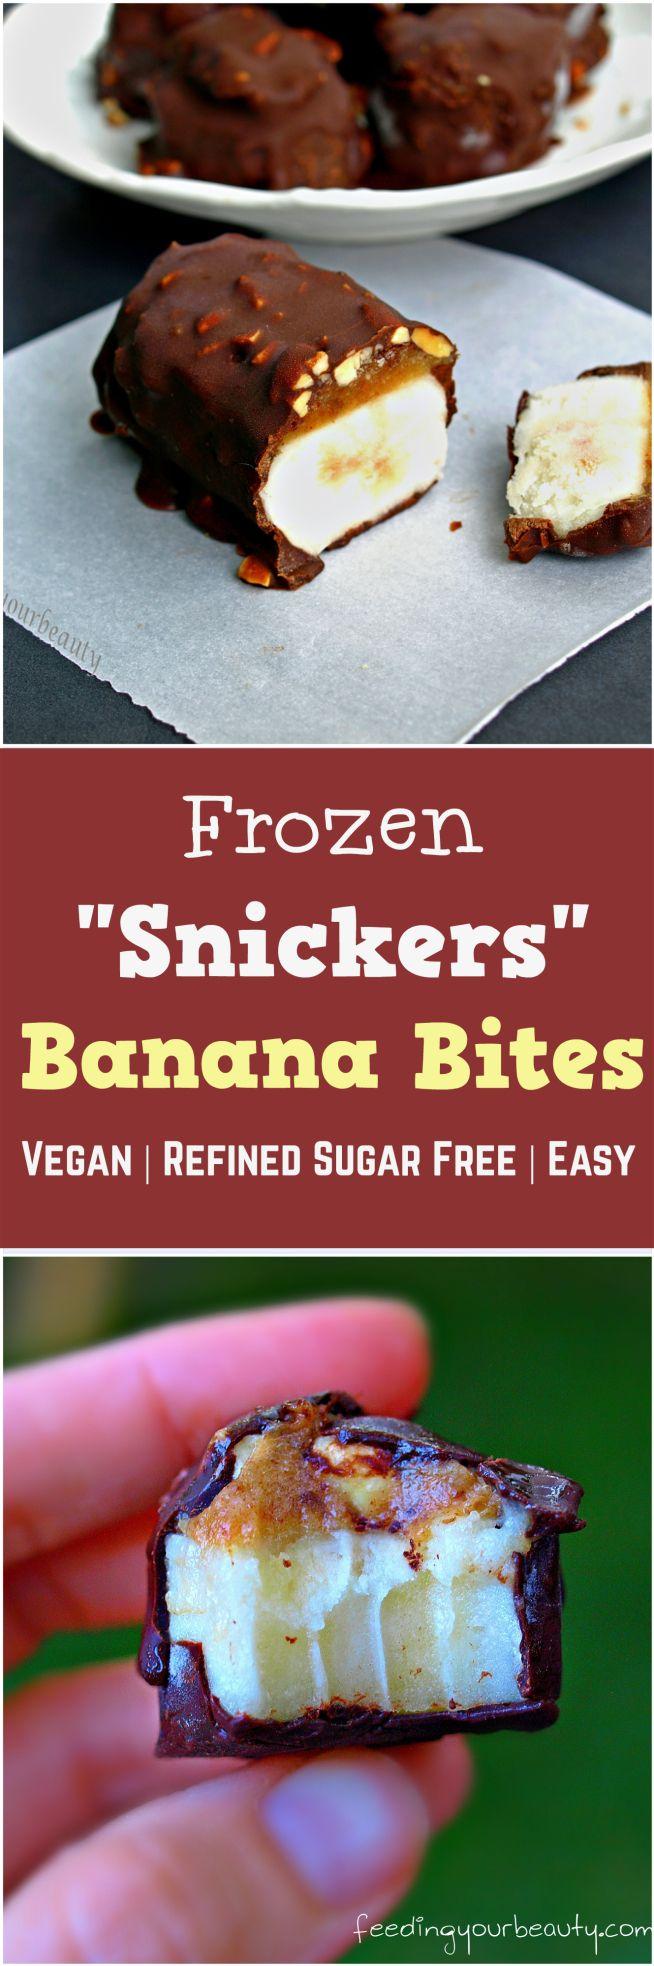 Vegan Snickers Banana Bites